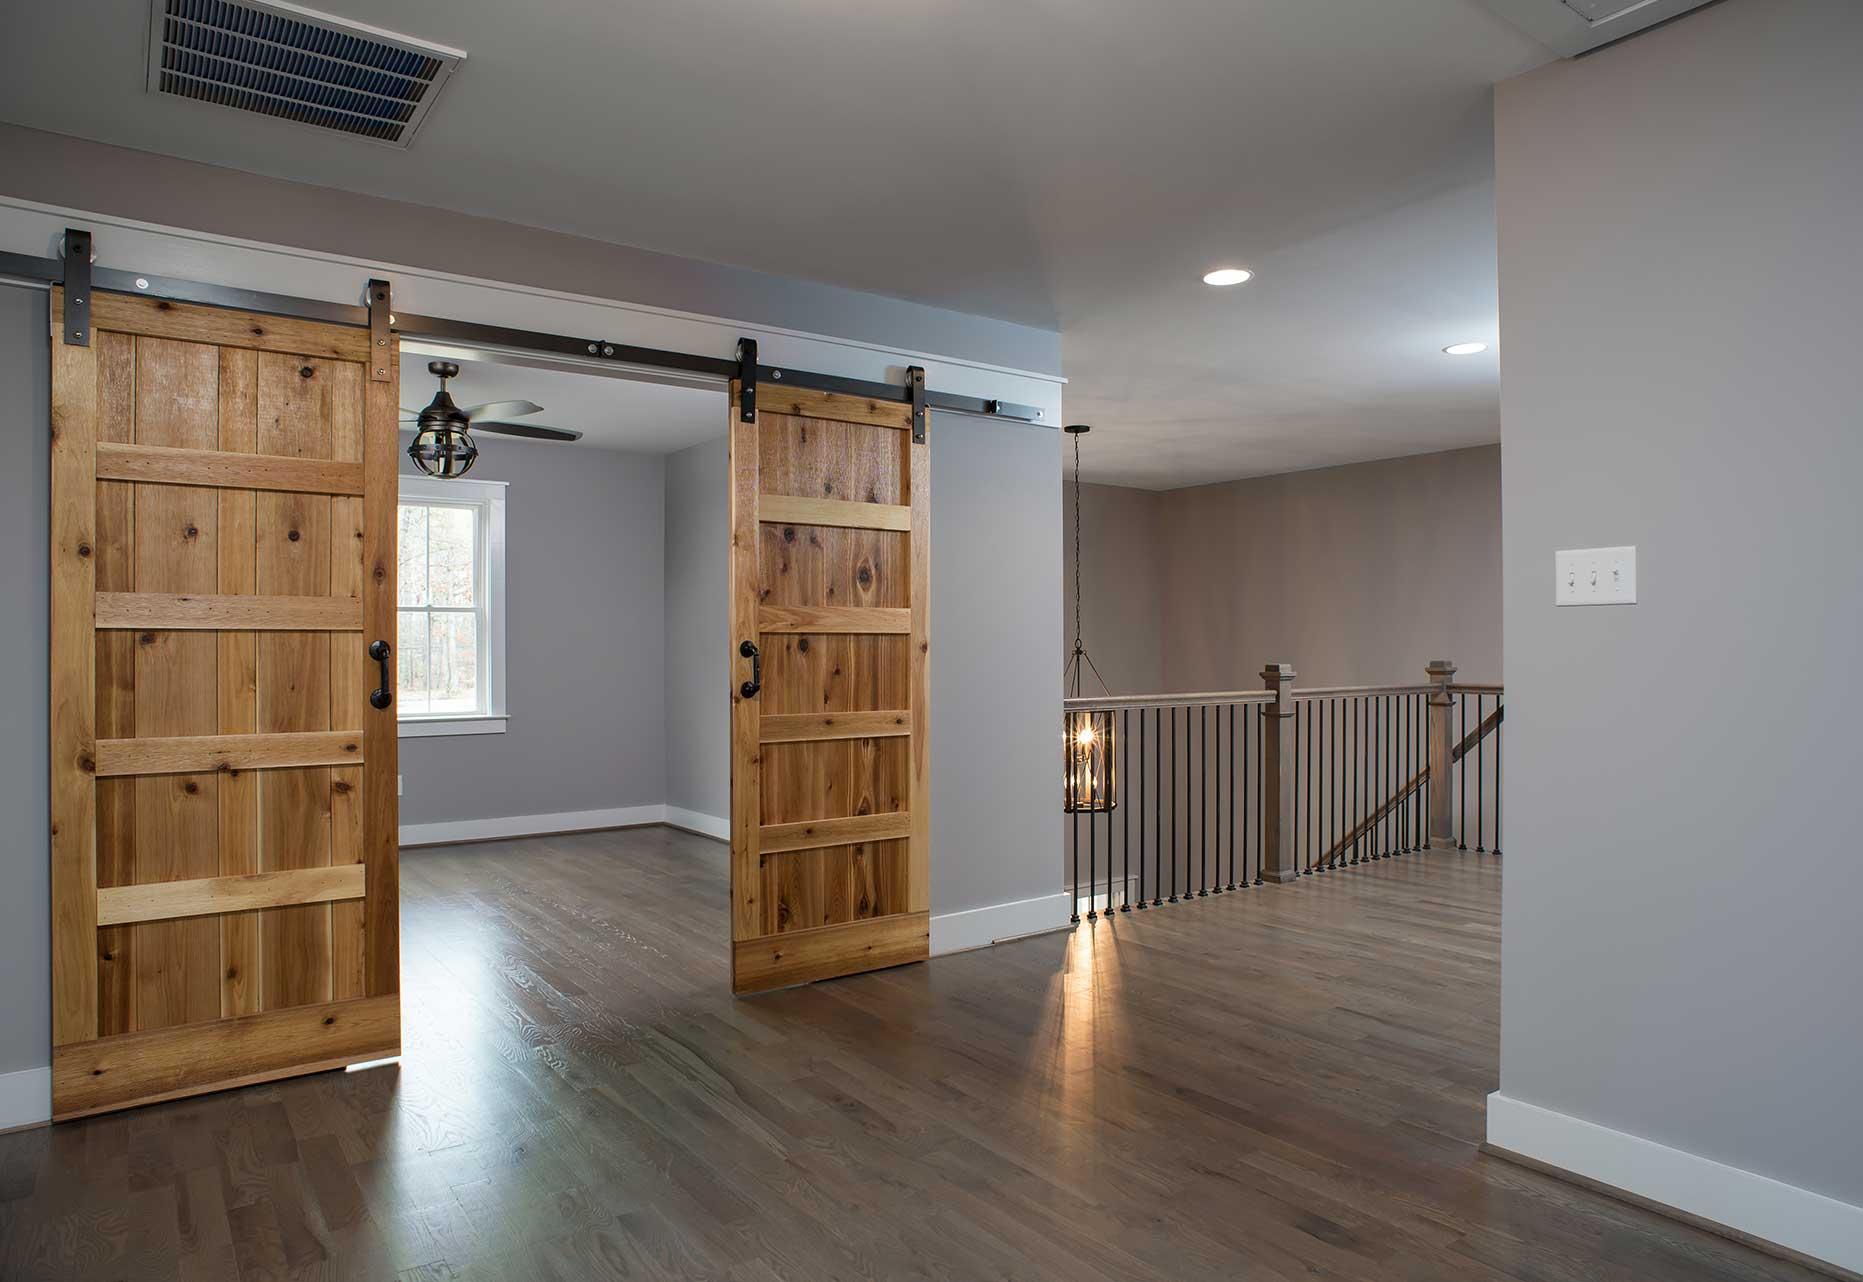 interior va richmond project nexsen care sitter clark veterans barfoot designers center